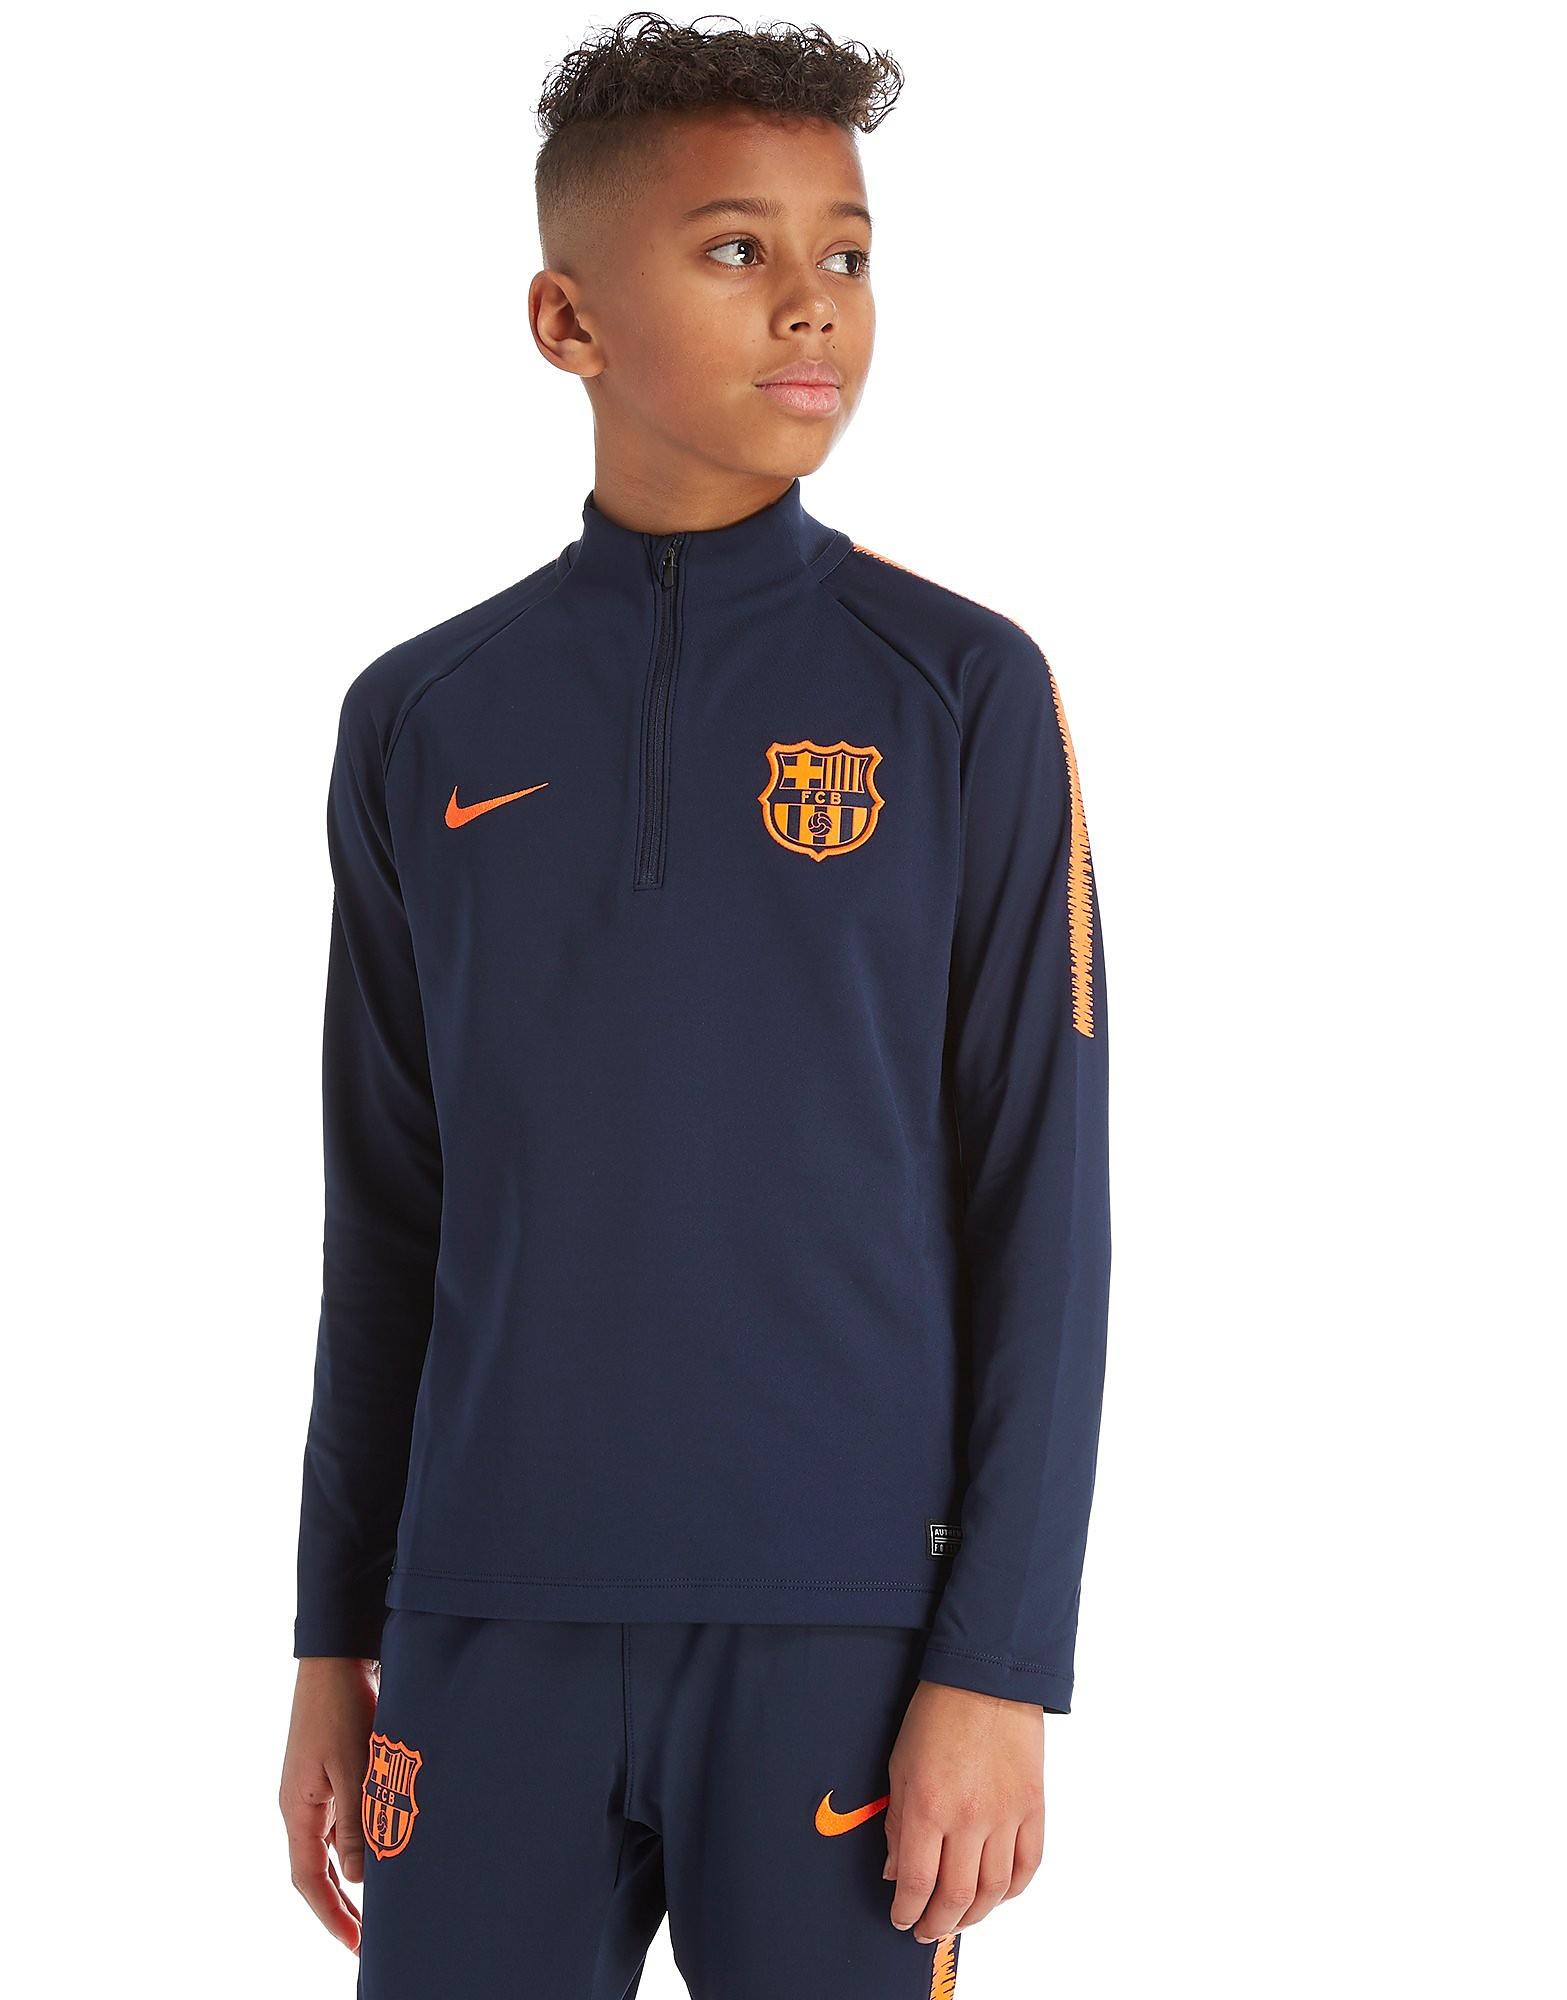 Nike Maillot FC Barcelona Dry Squad Drill 1/4 Zip Junior